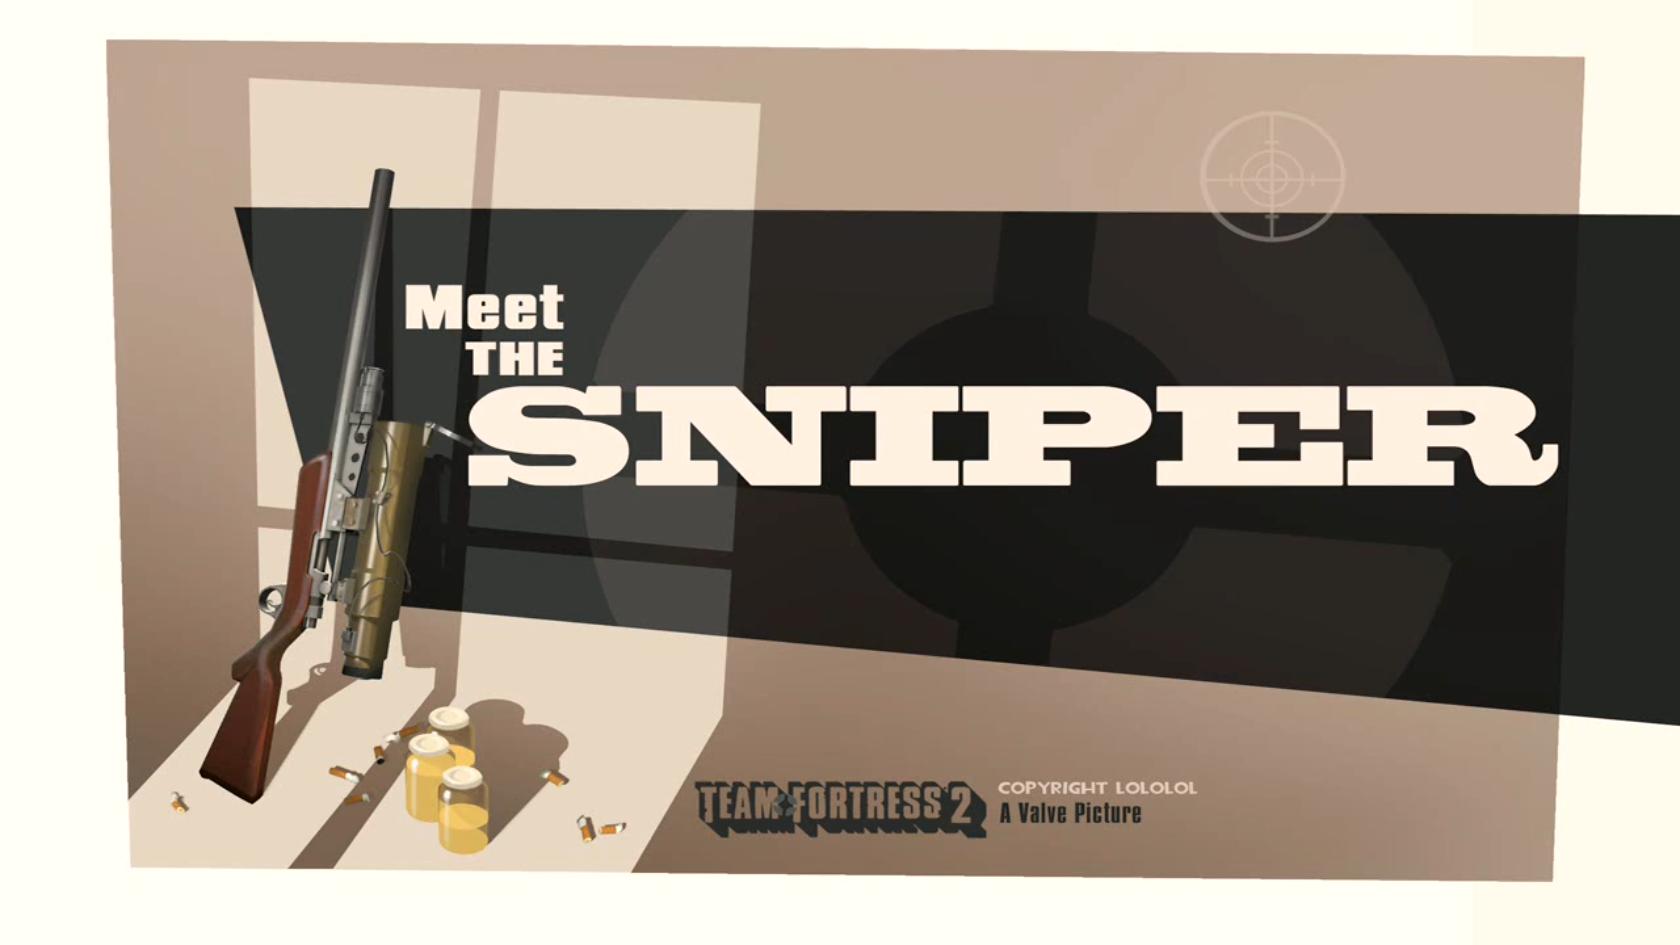 tf2 meet the sniper fr